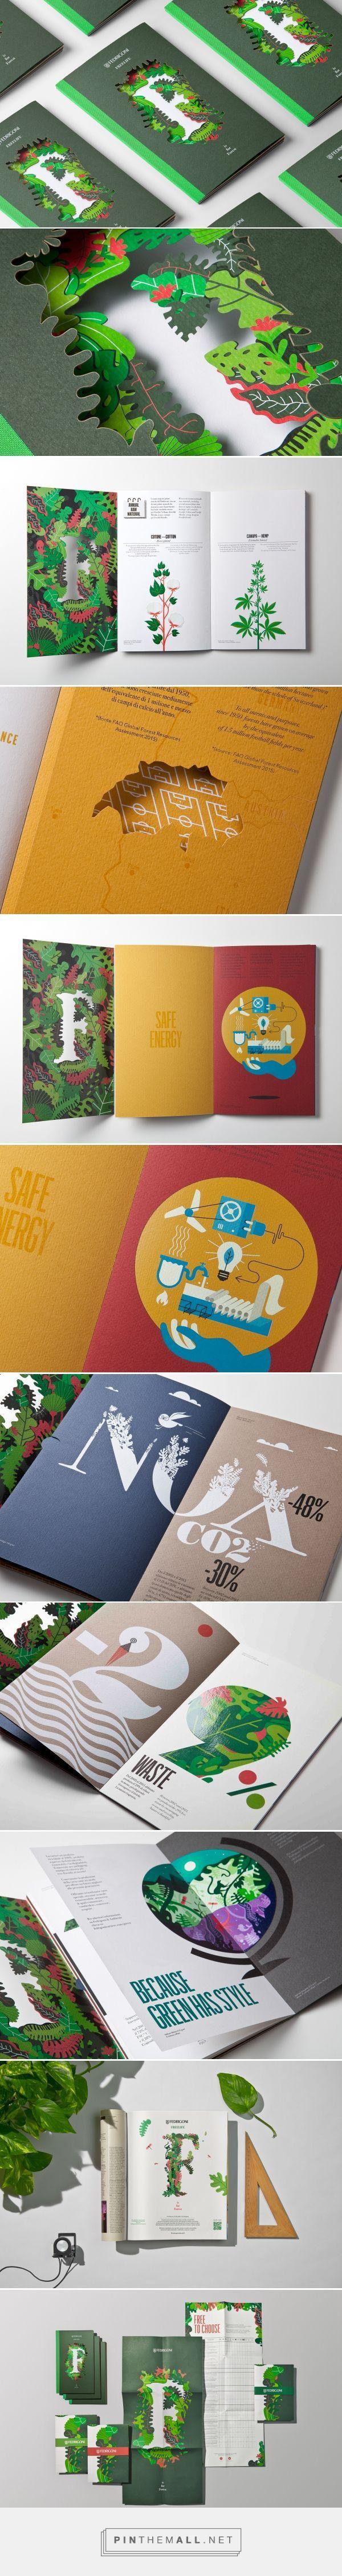 Lo mismo pero con collage inspiration universidad for Diseno grafico universidades